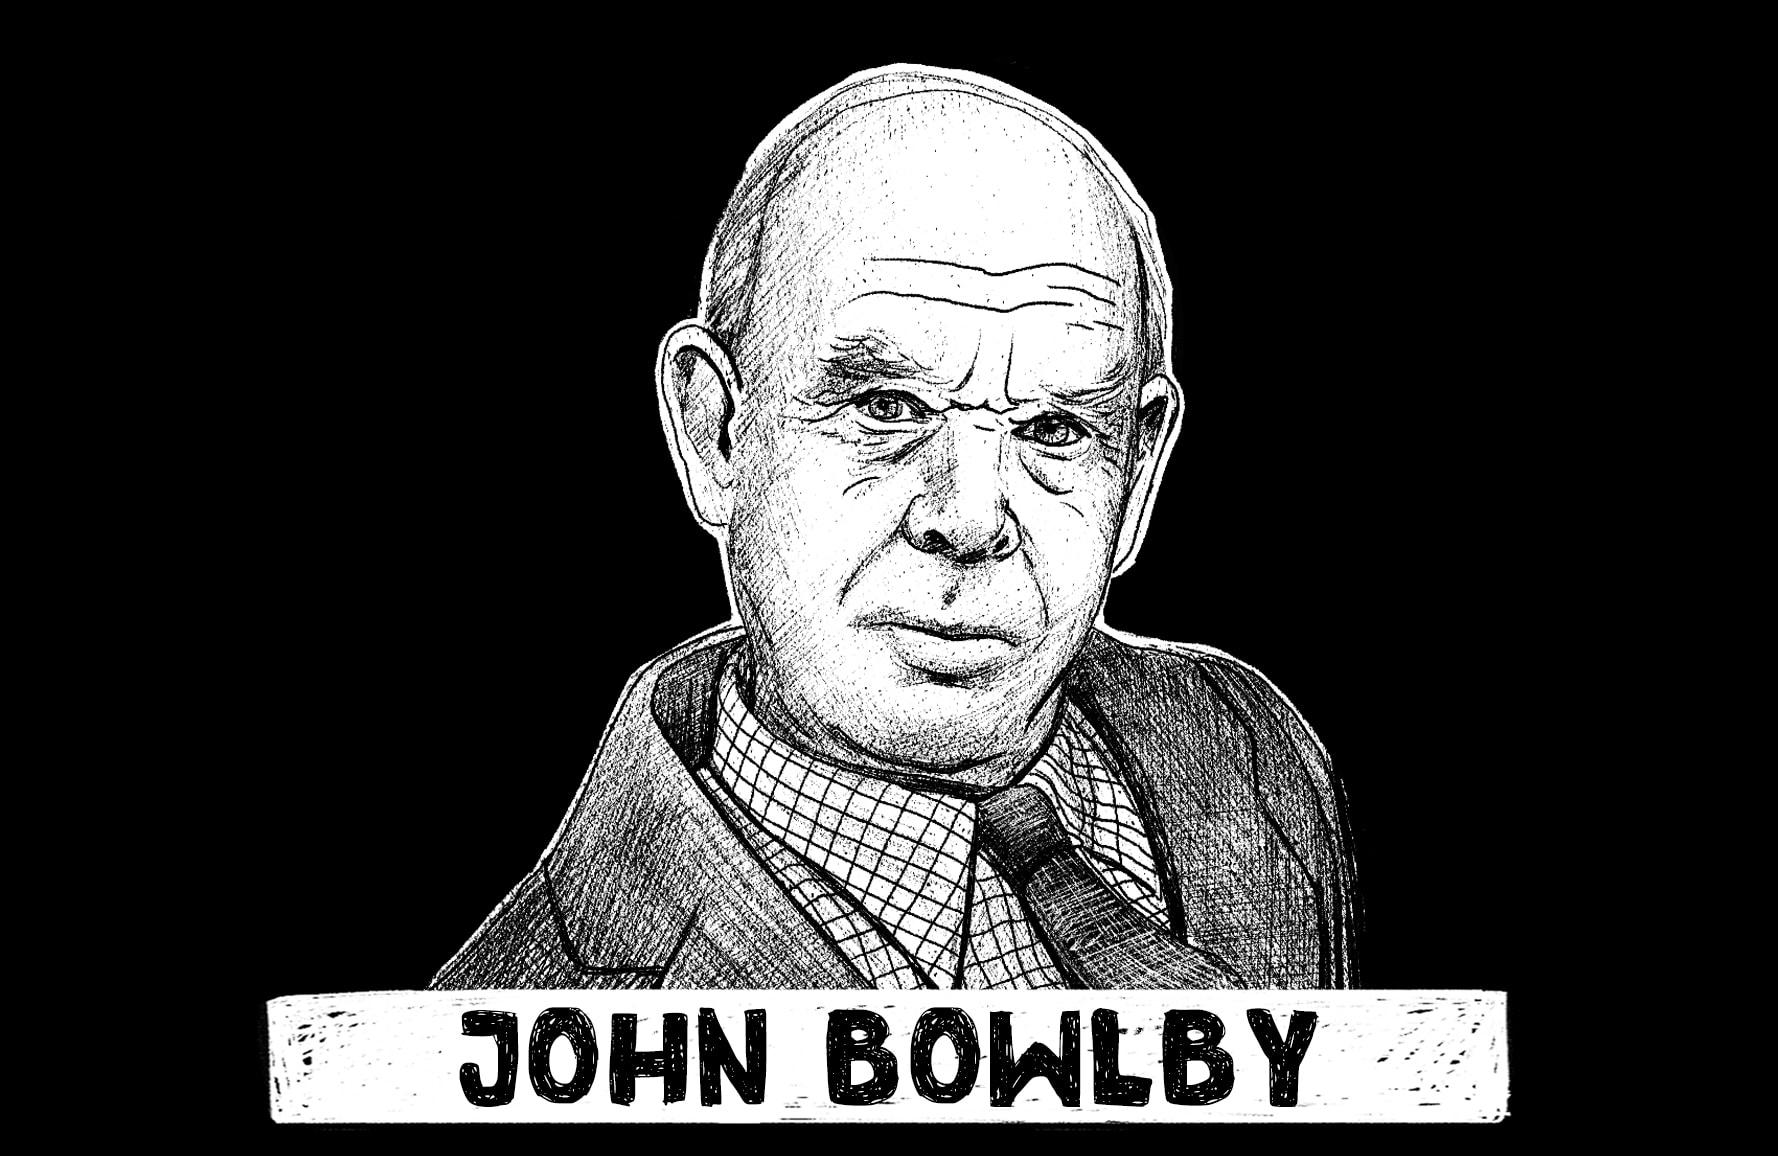 John Bolwby